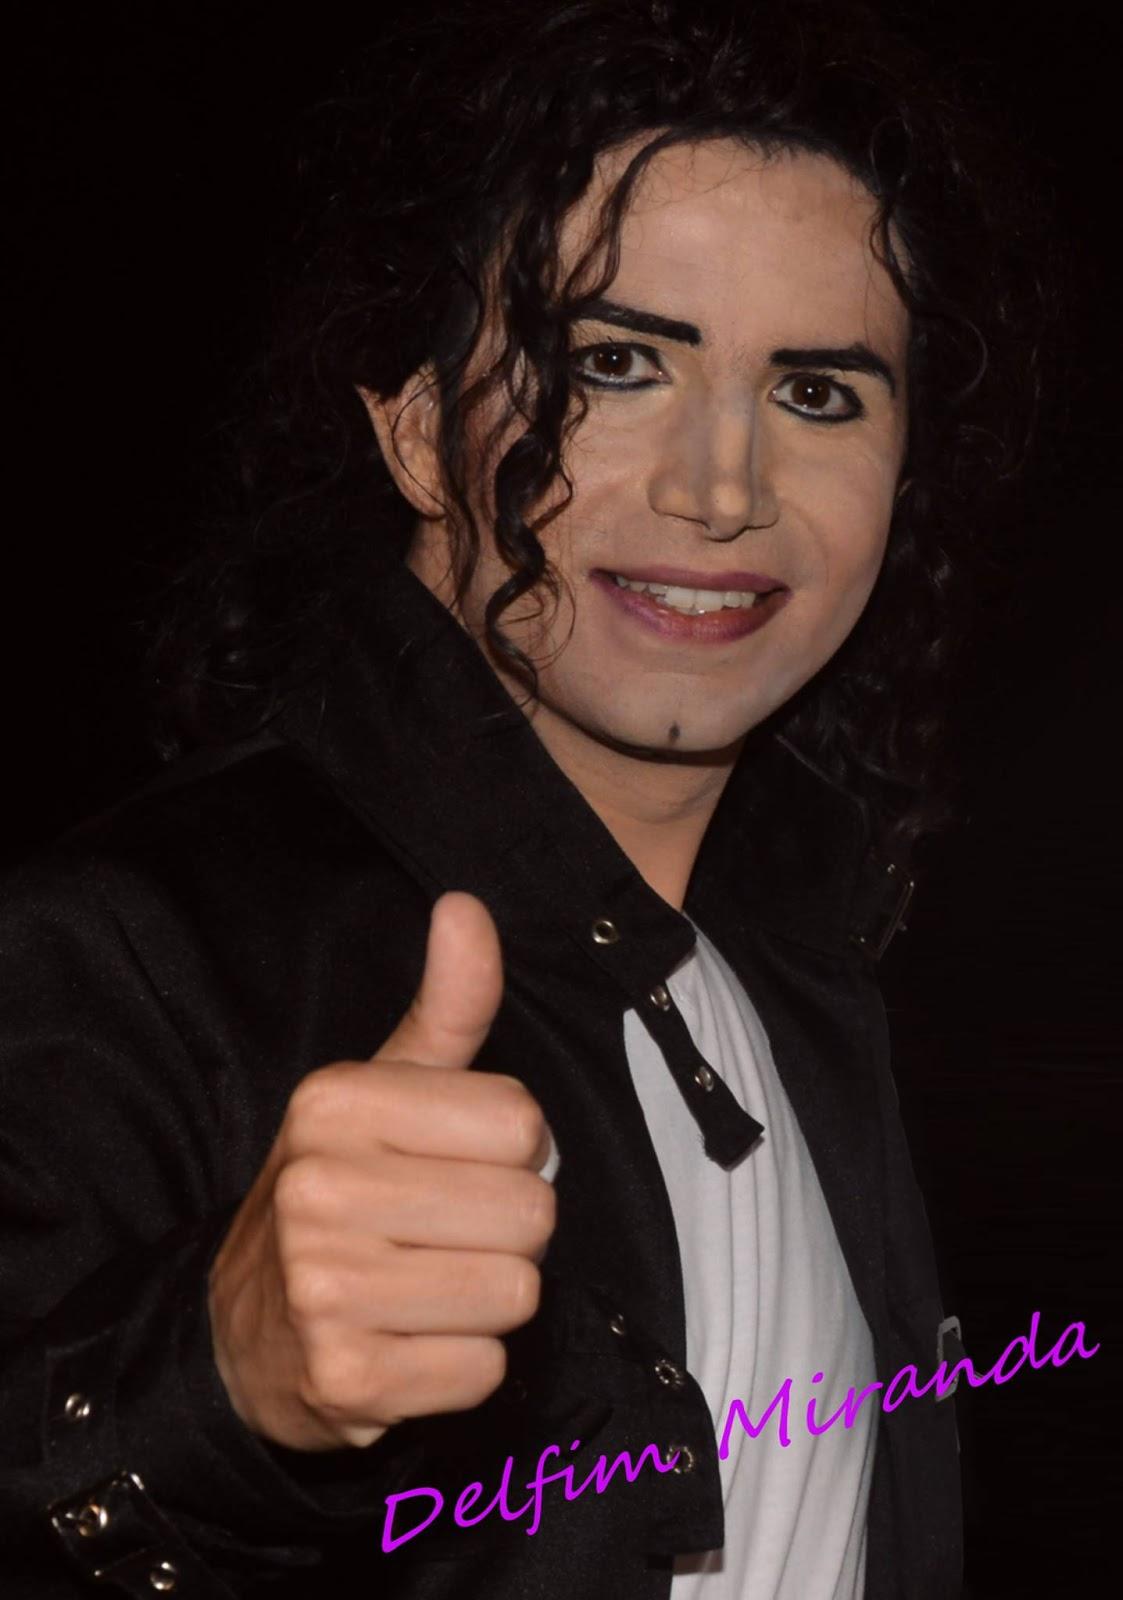 Delfim Miranda - Michael Jackson Tribute - Bad - After Show